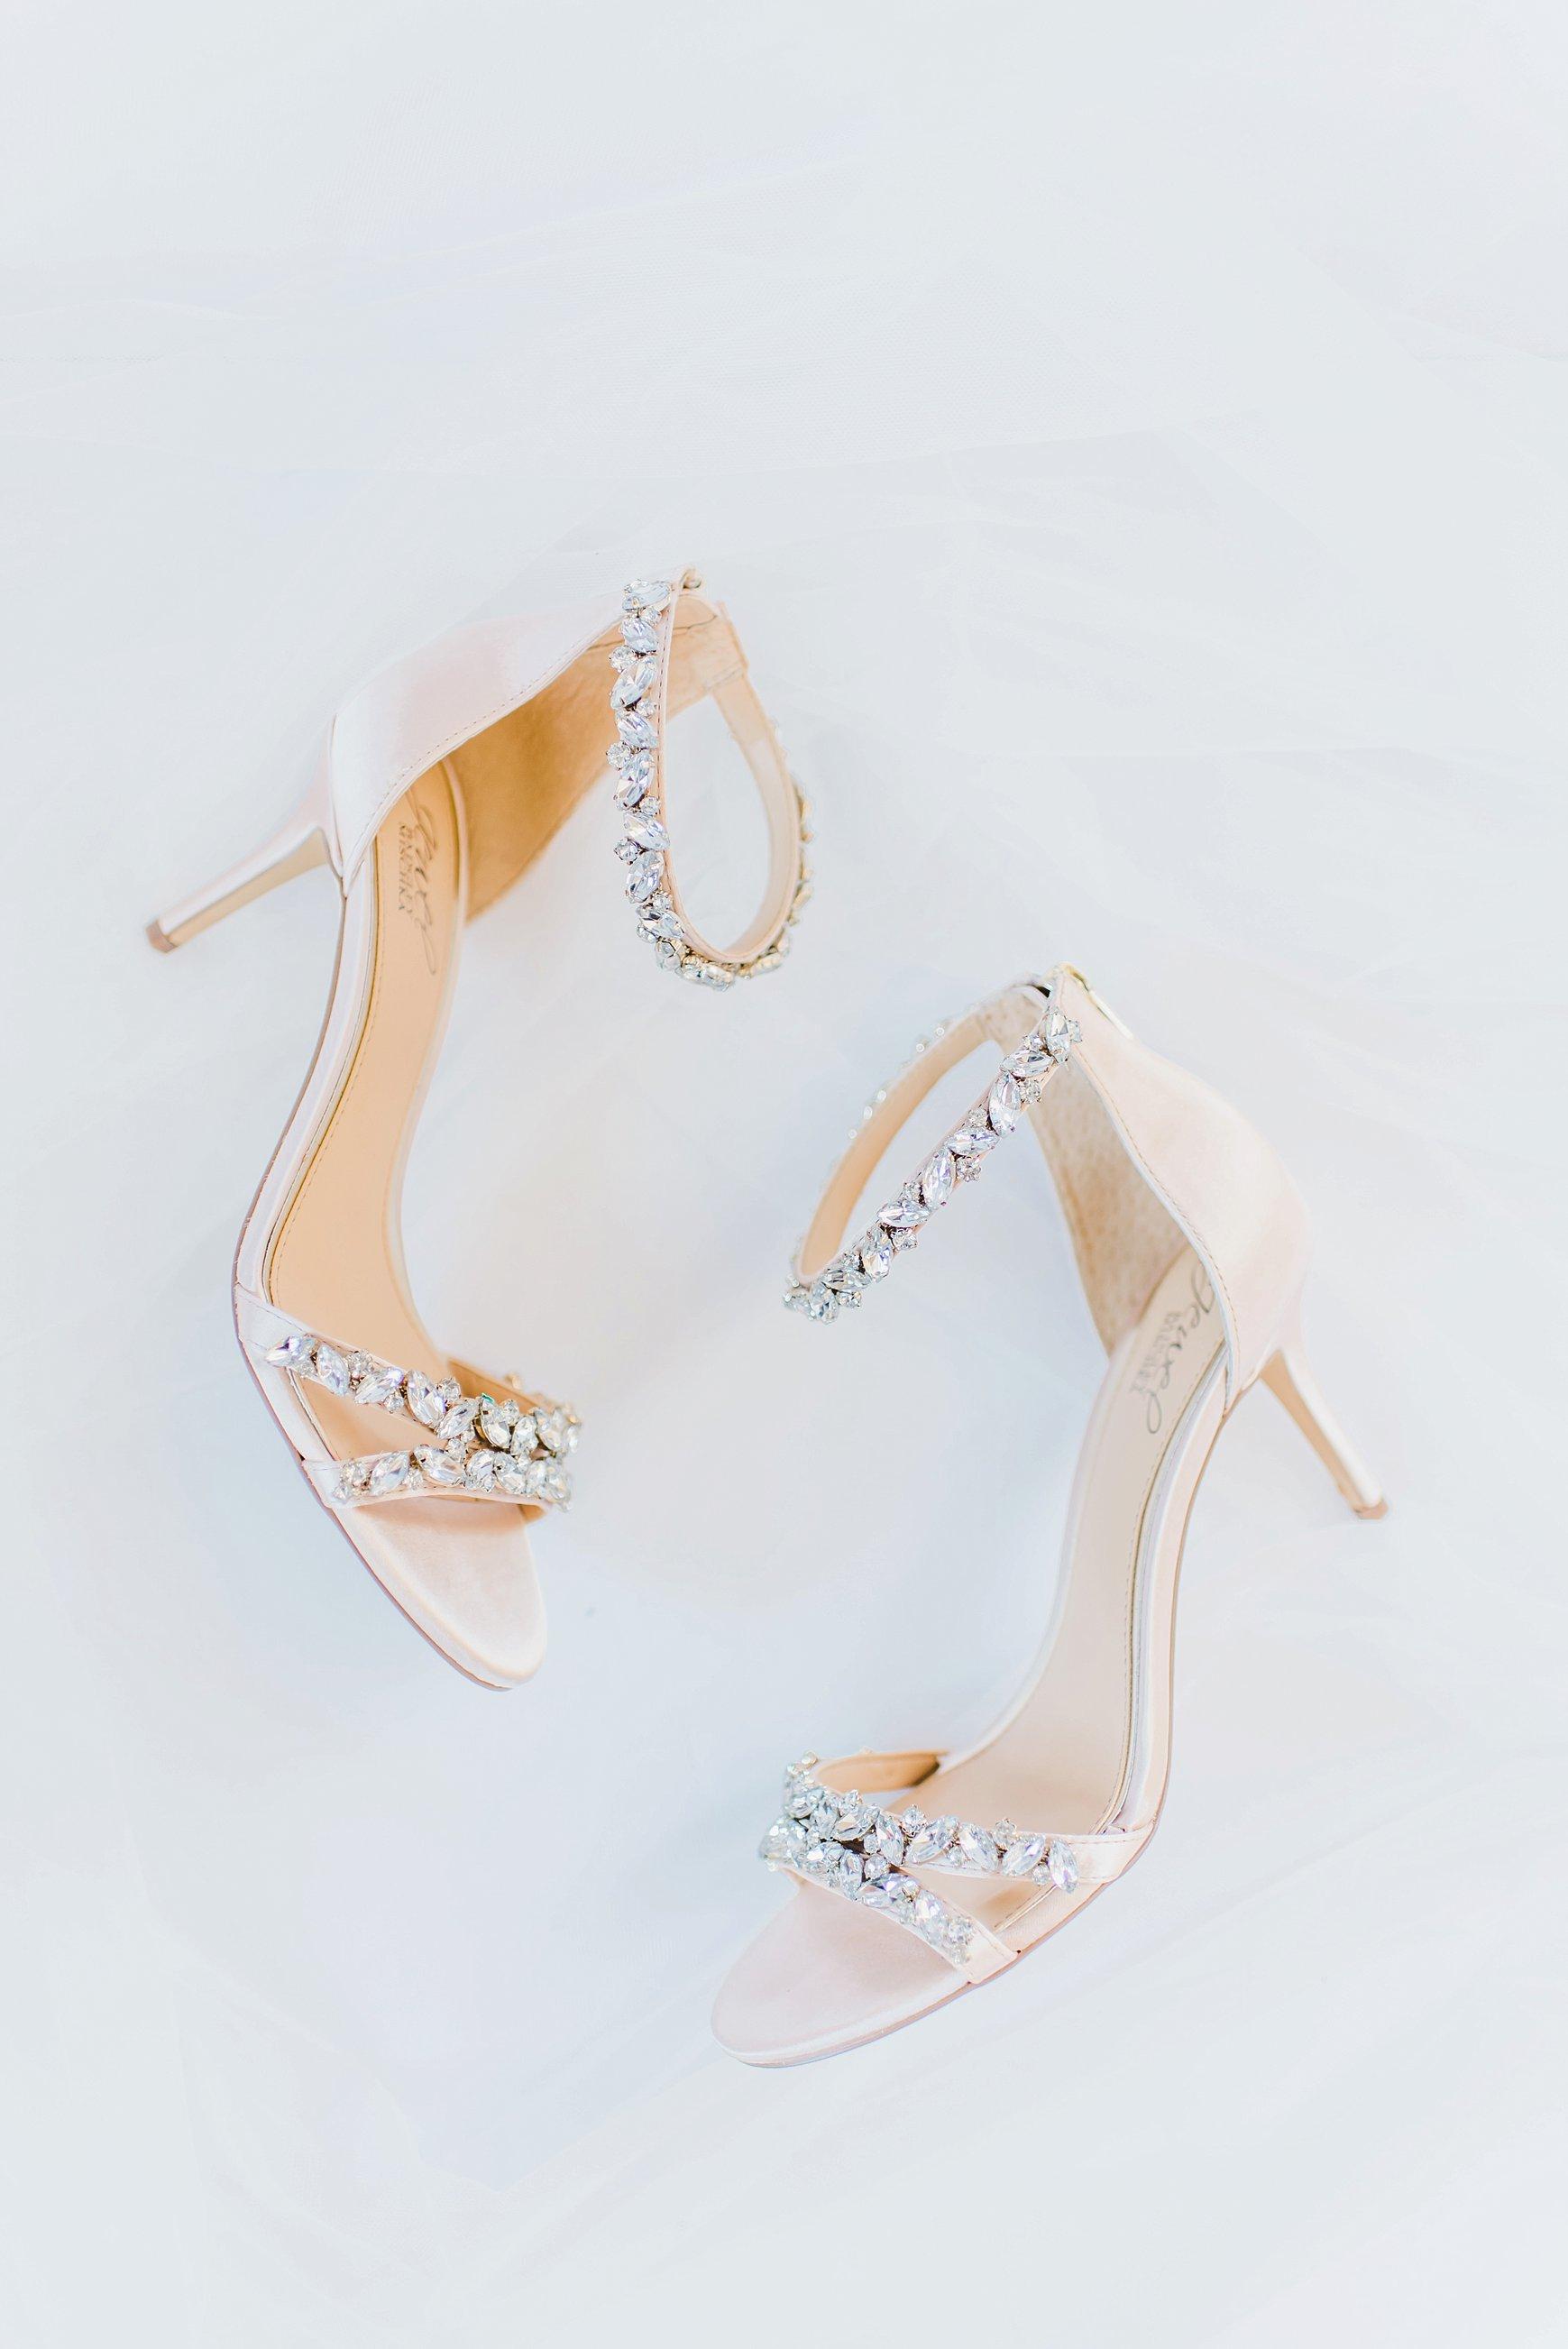 I loved Kaylea's choice in  Badgley Mischka  bridal shoes!